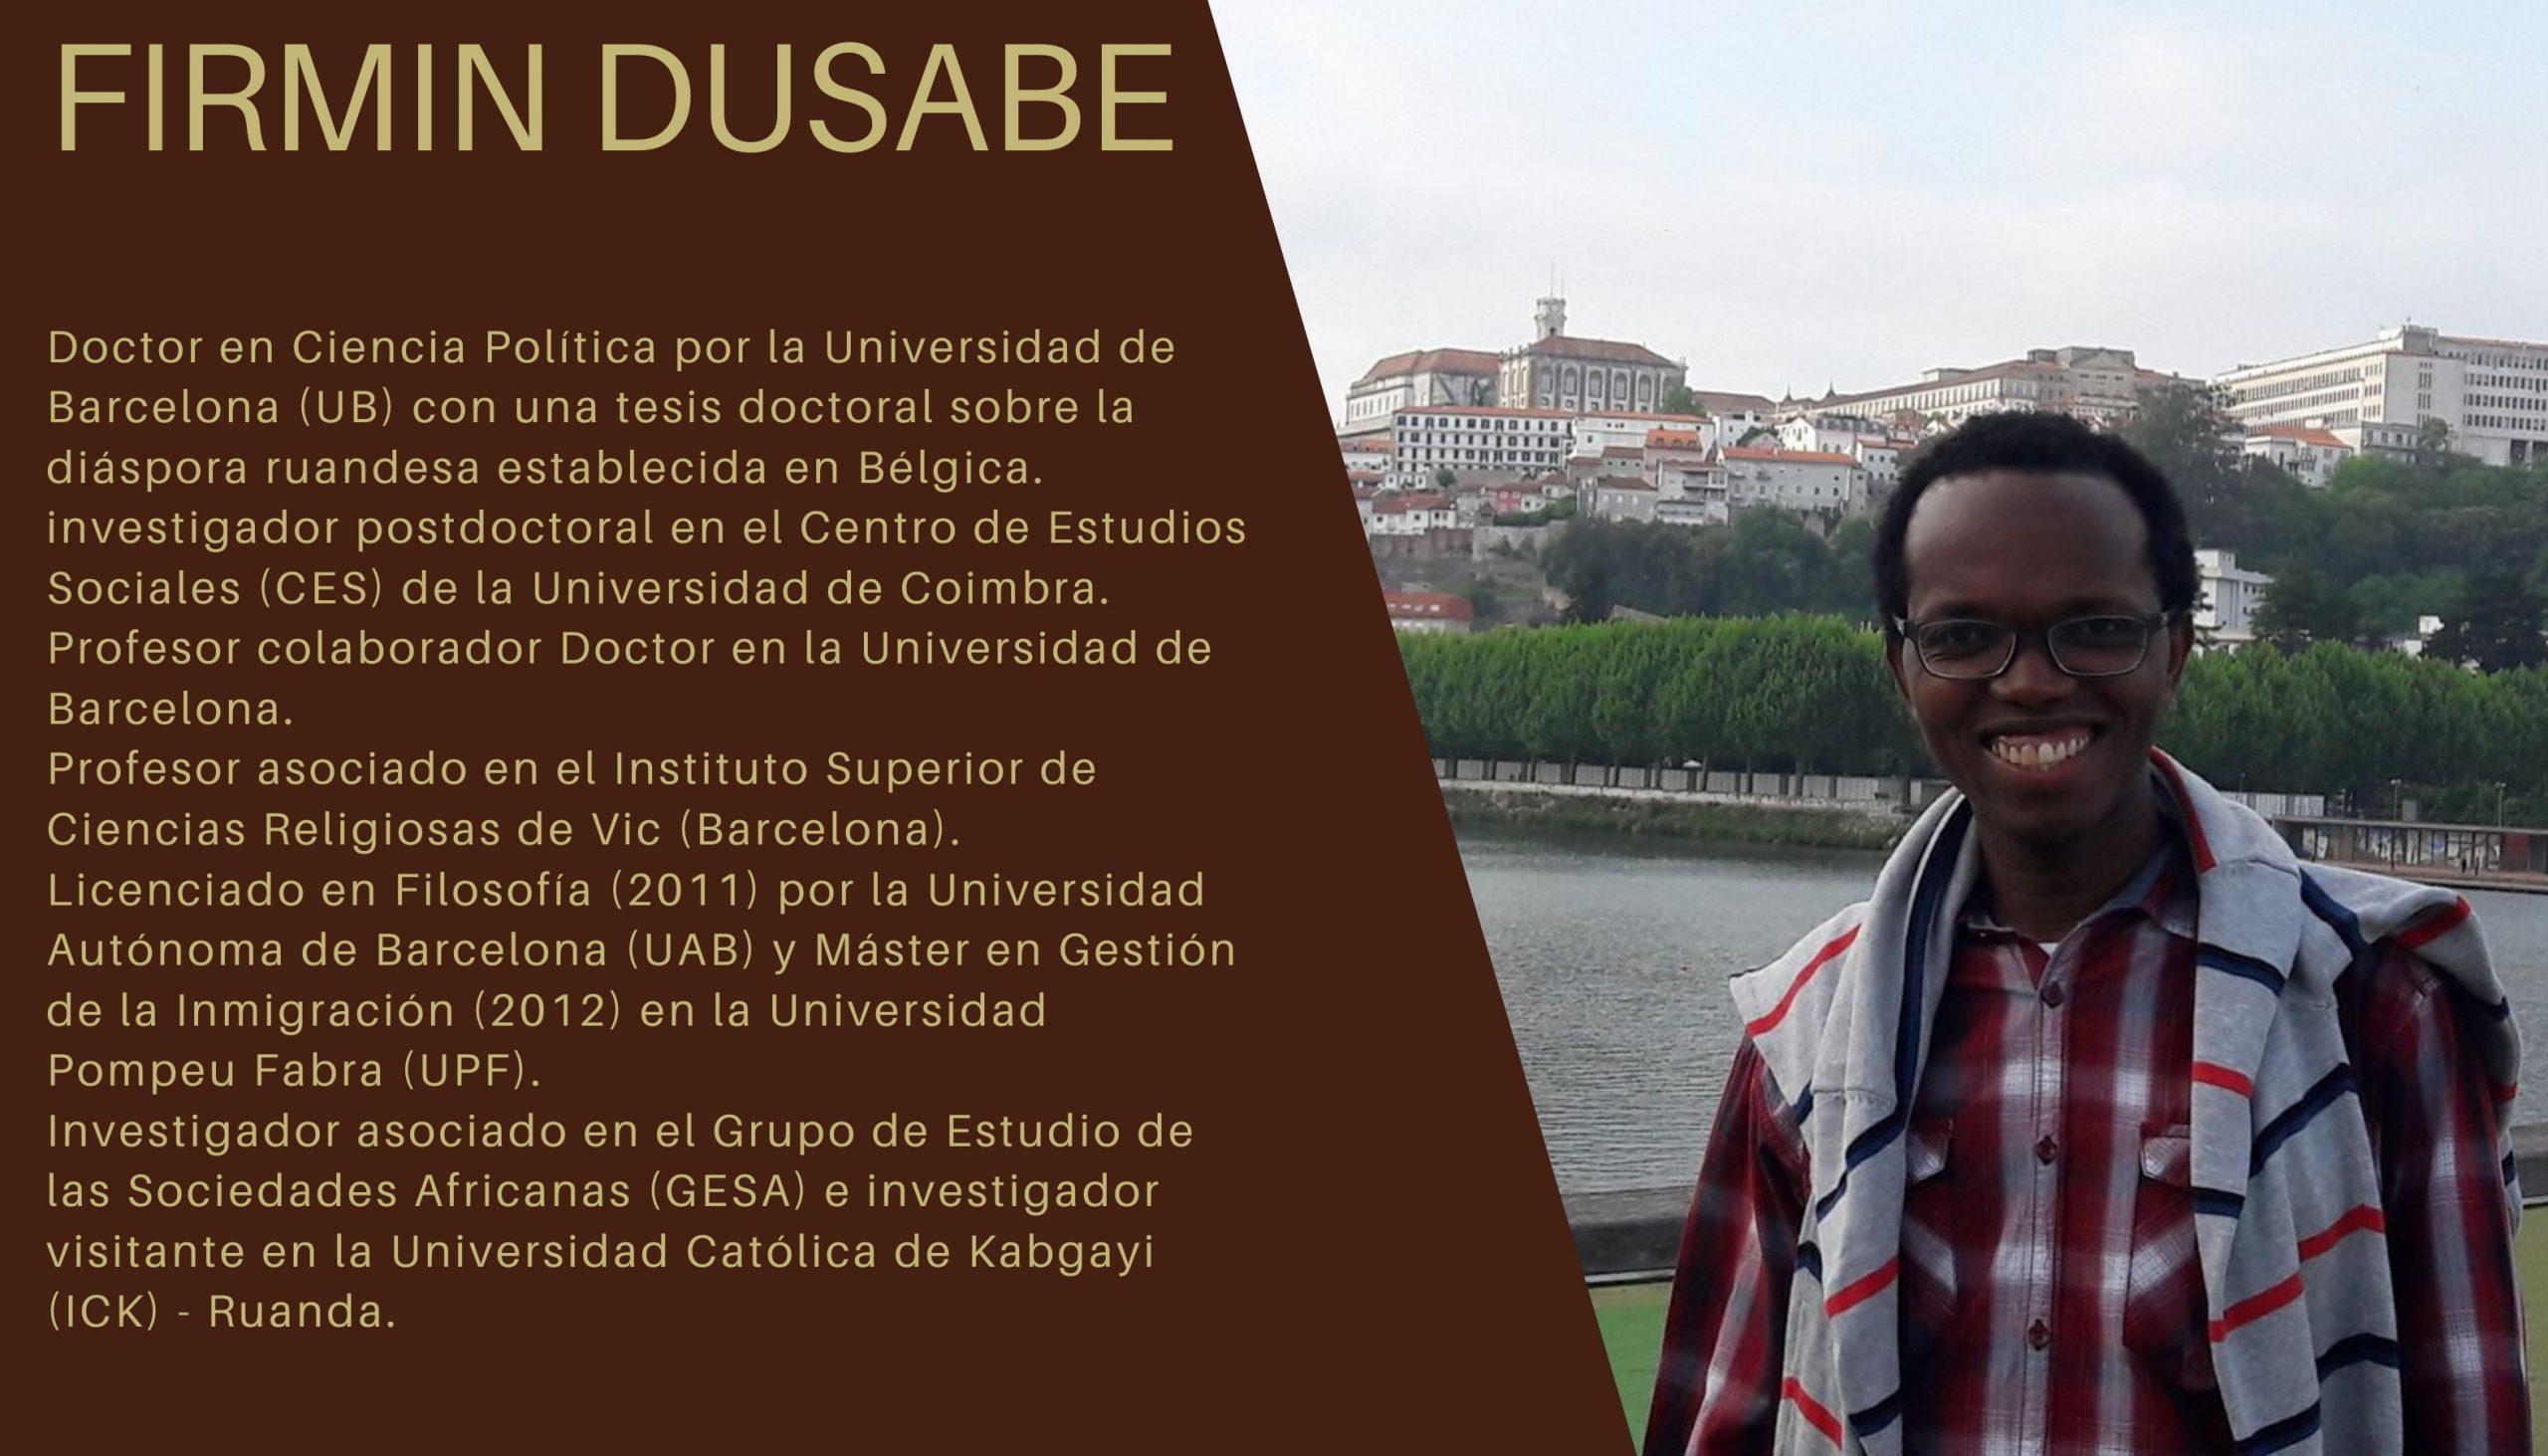 Firmin_Dusabe_presentacion